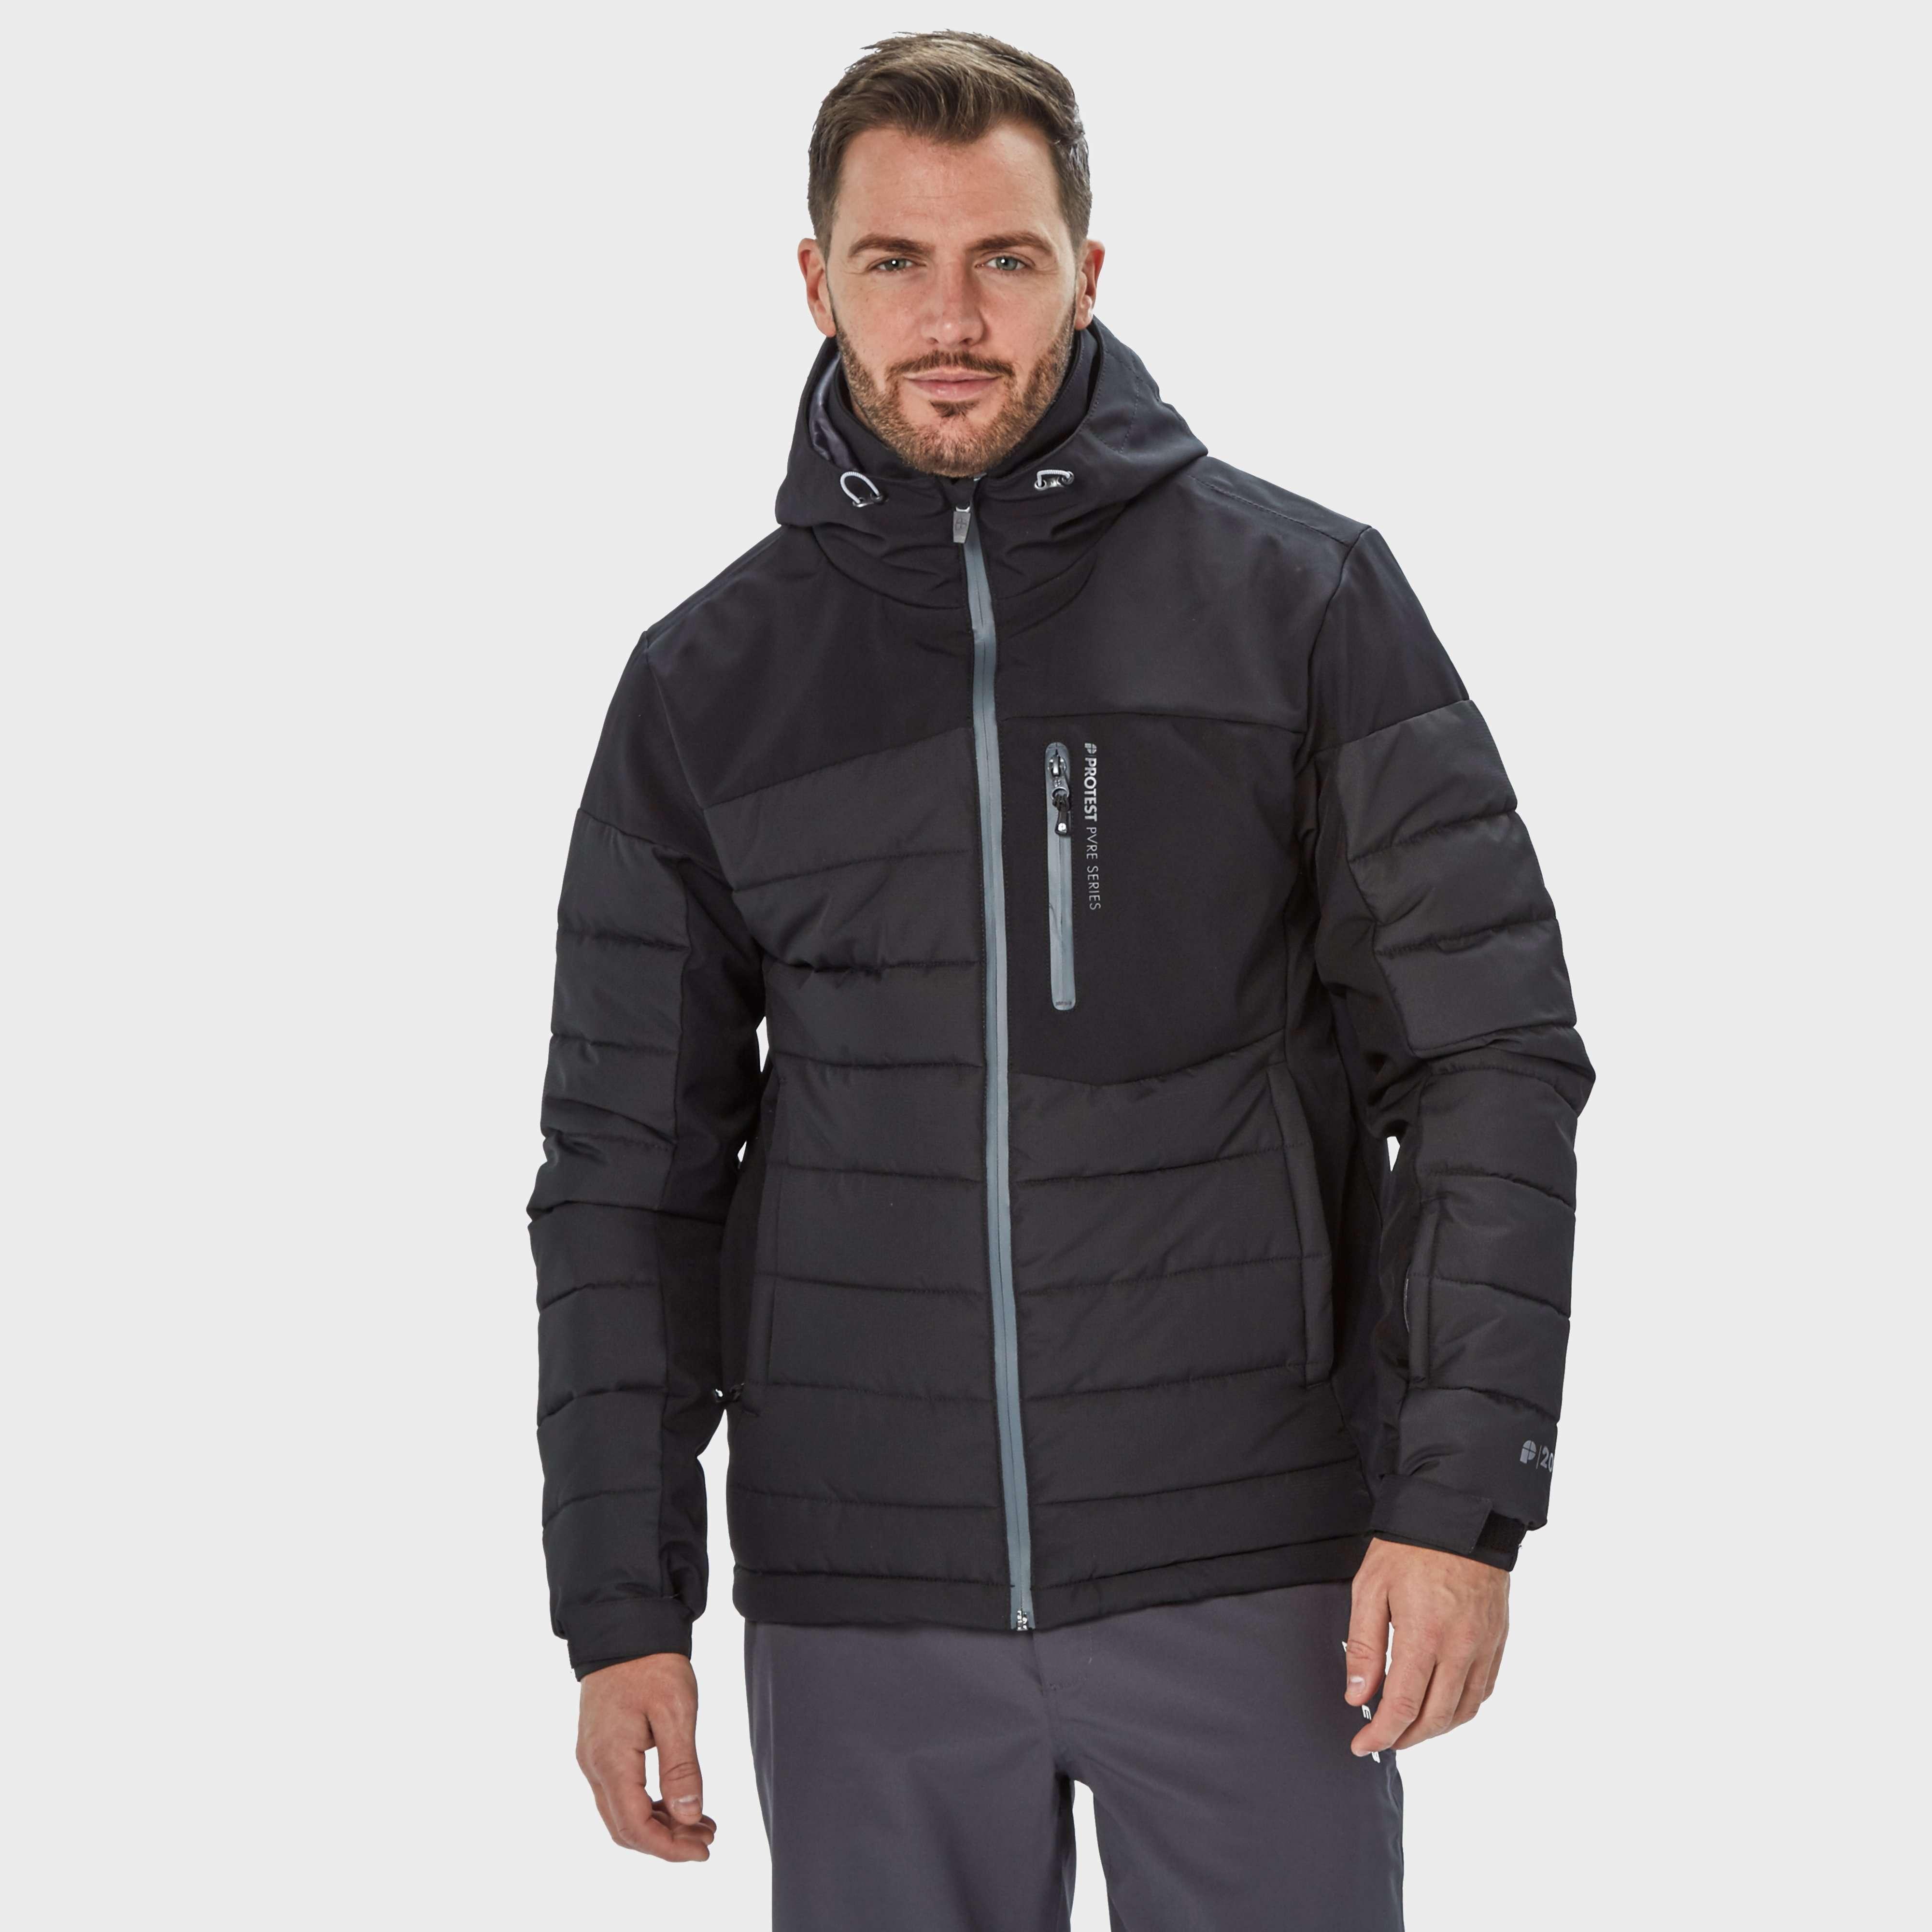 PROTEST Men's Mount Snow Jacket